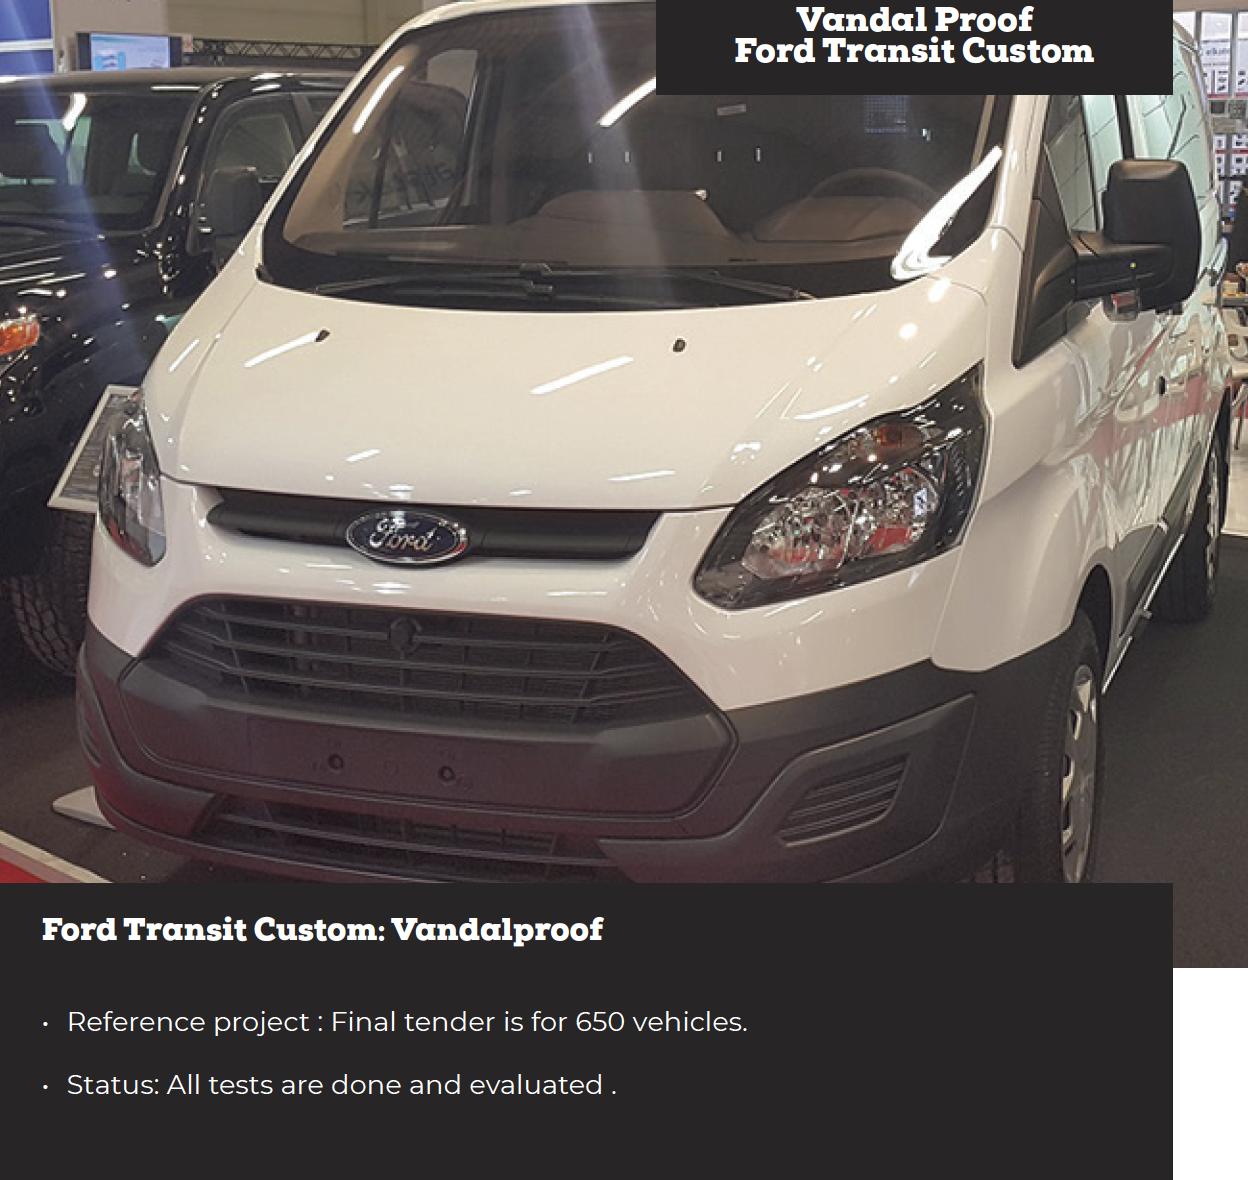 Vandal Prof Ford Transit